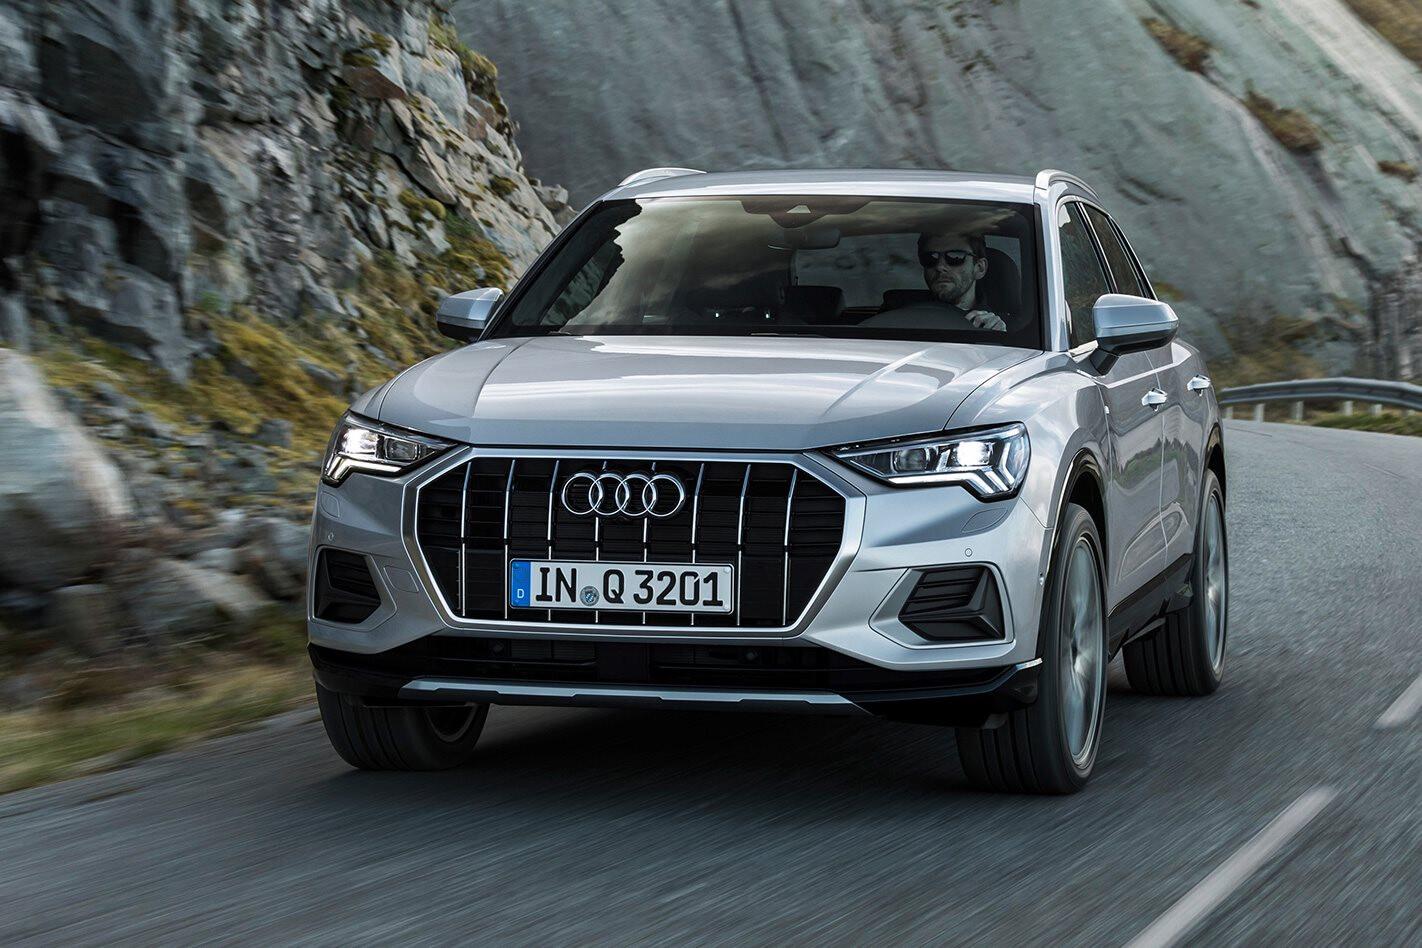 New Suvs Audi Jpg